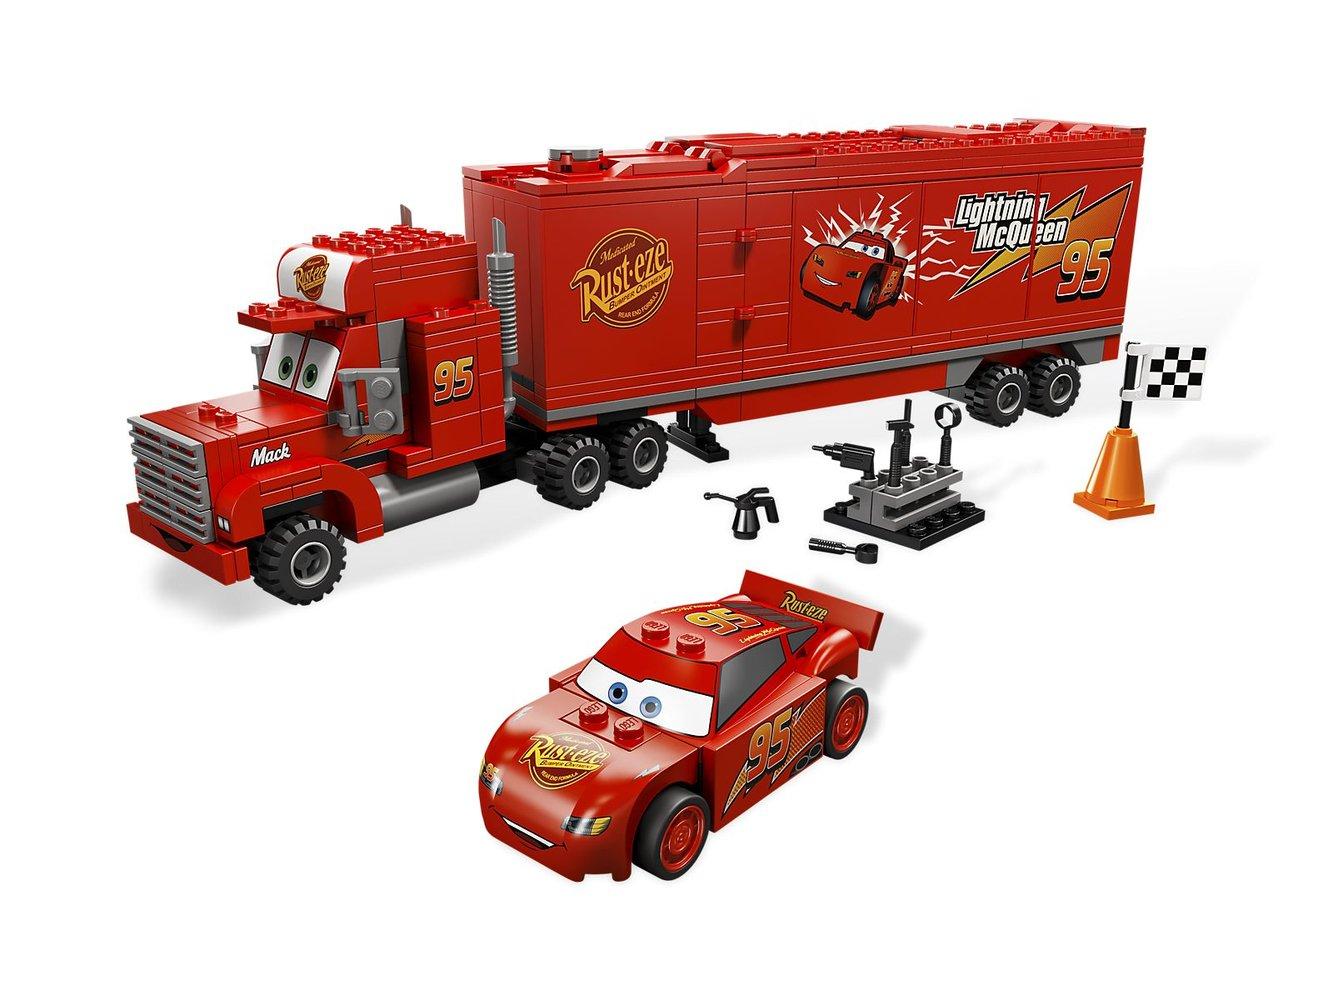 Mack's Team Truck